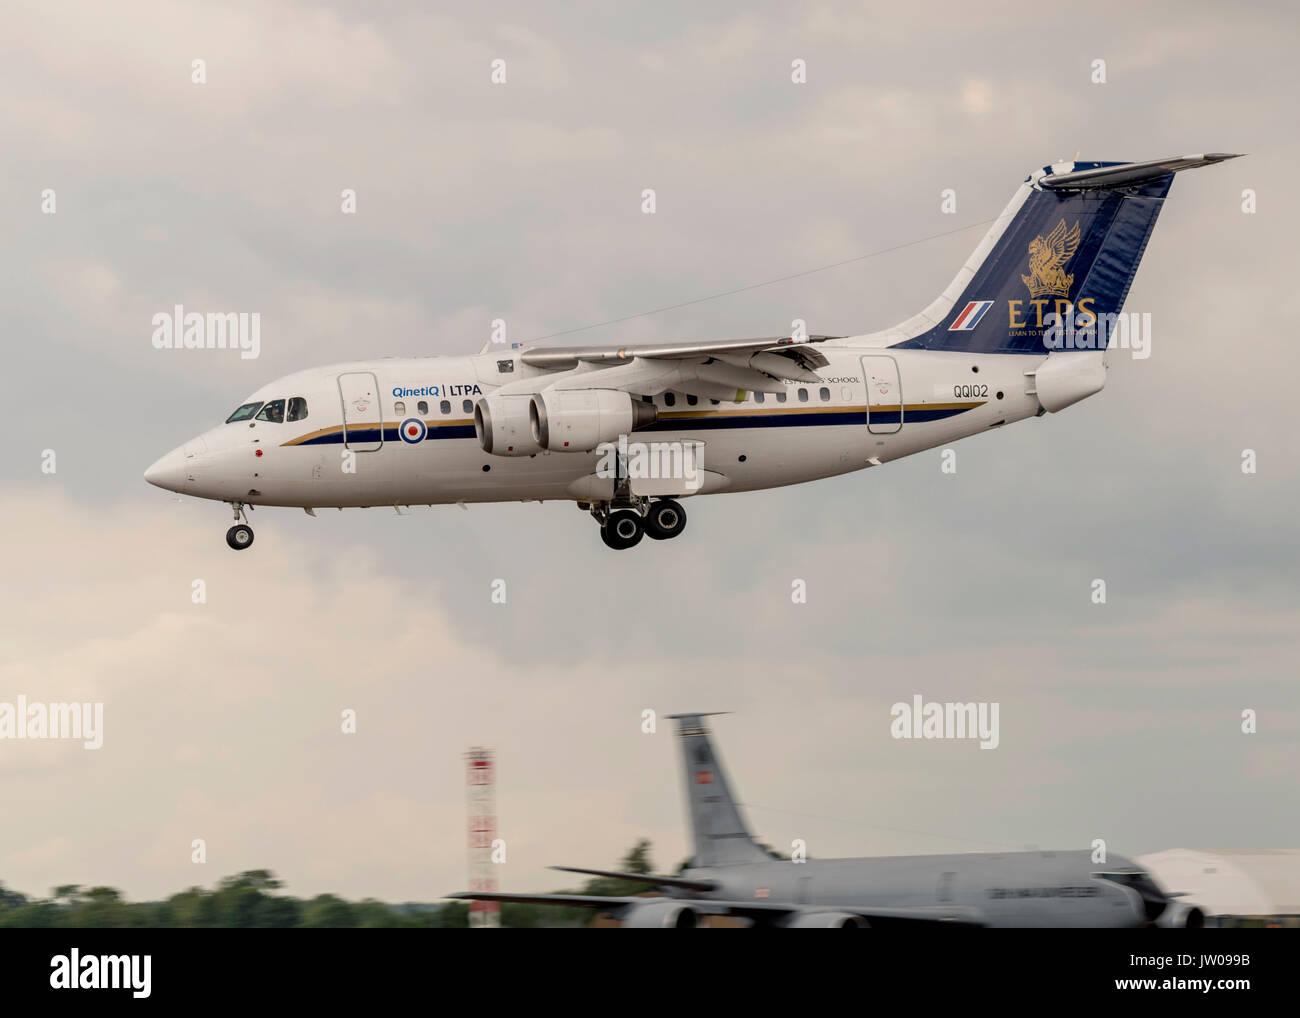 AVRO RJ100, ETPS, Qinetiq - Stock Image